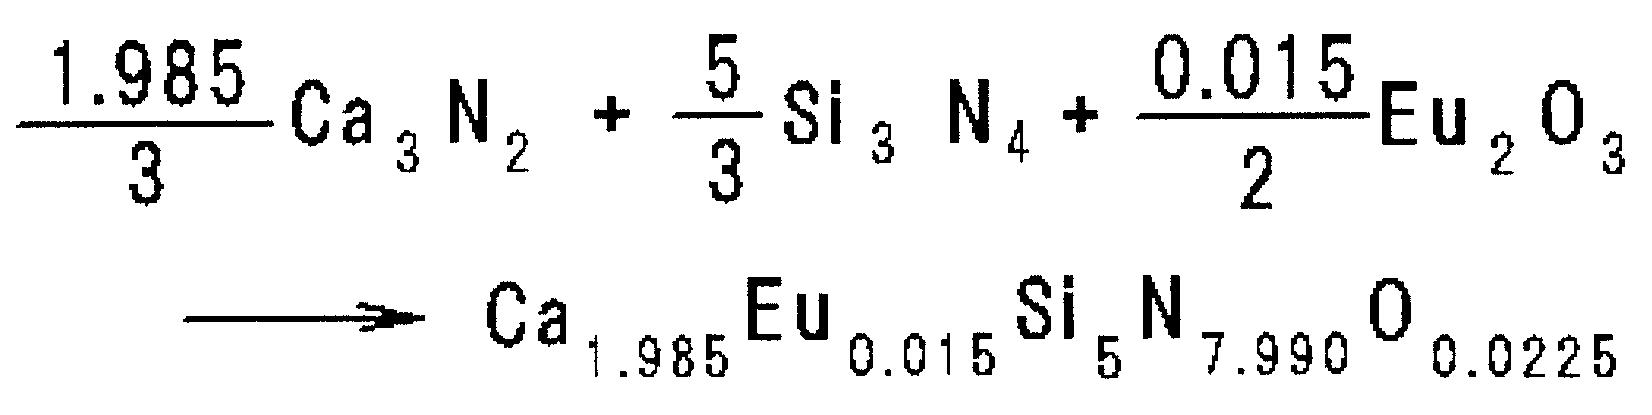 Figure 112006018872163-pct00025